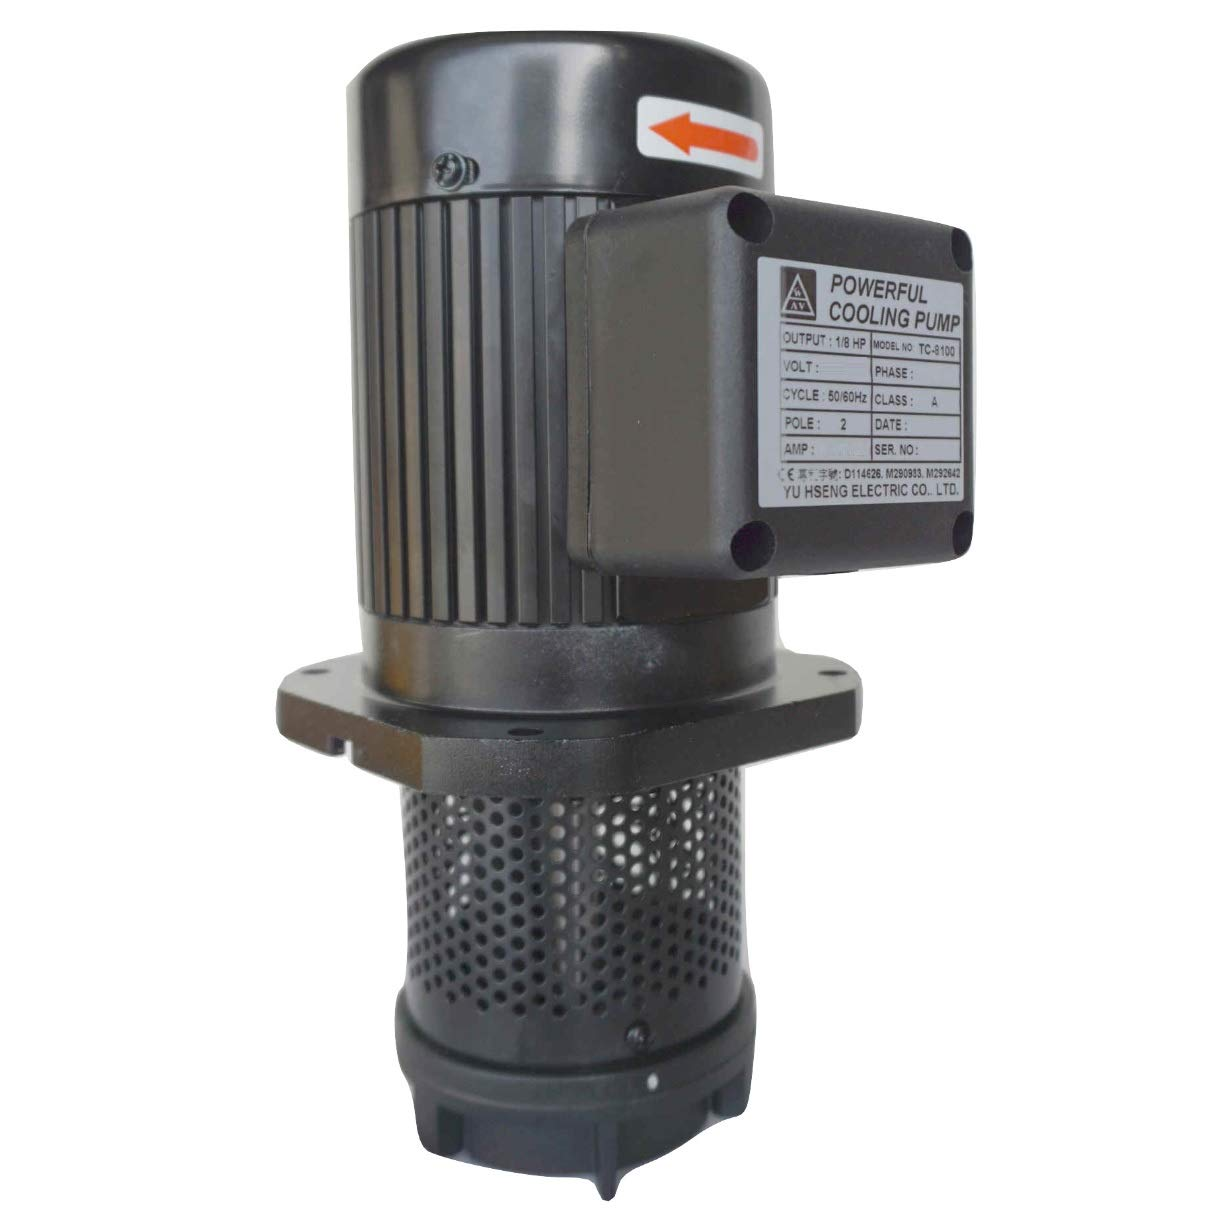 4 Immersion Length 100mm Three 3 Phase 208//415V 1//8 HP Lathe BandSaw Machine Tool Circulation Coolant Pump NPT 1//2 Thread